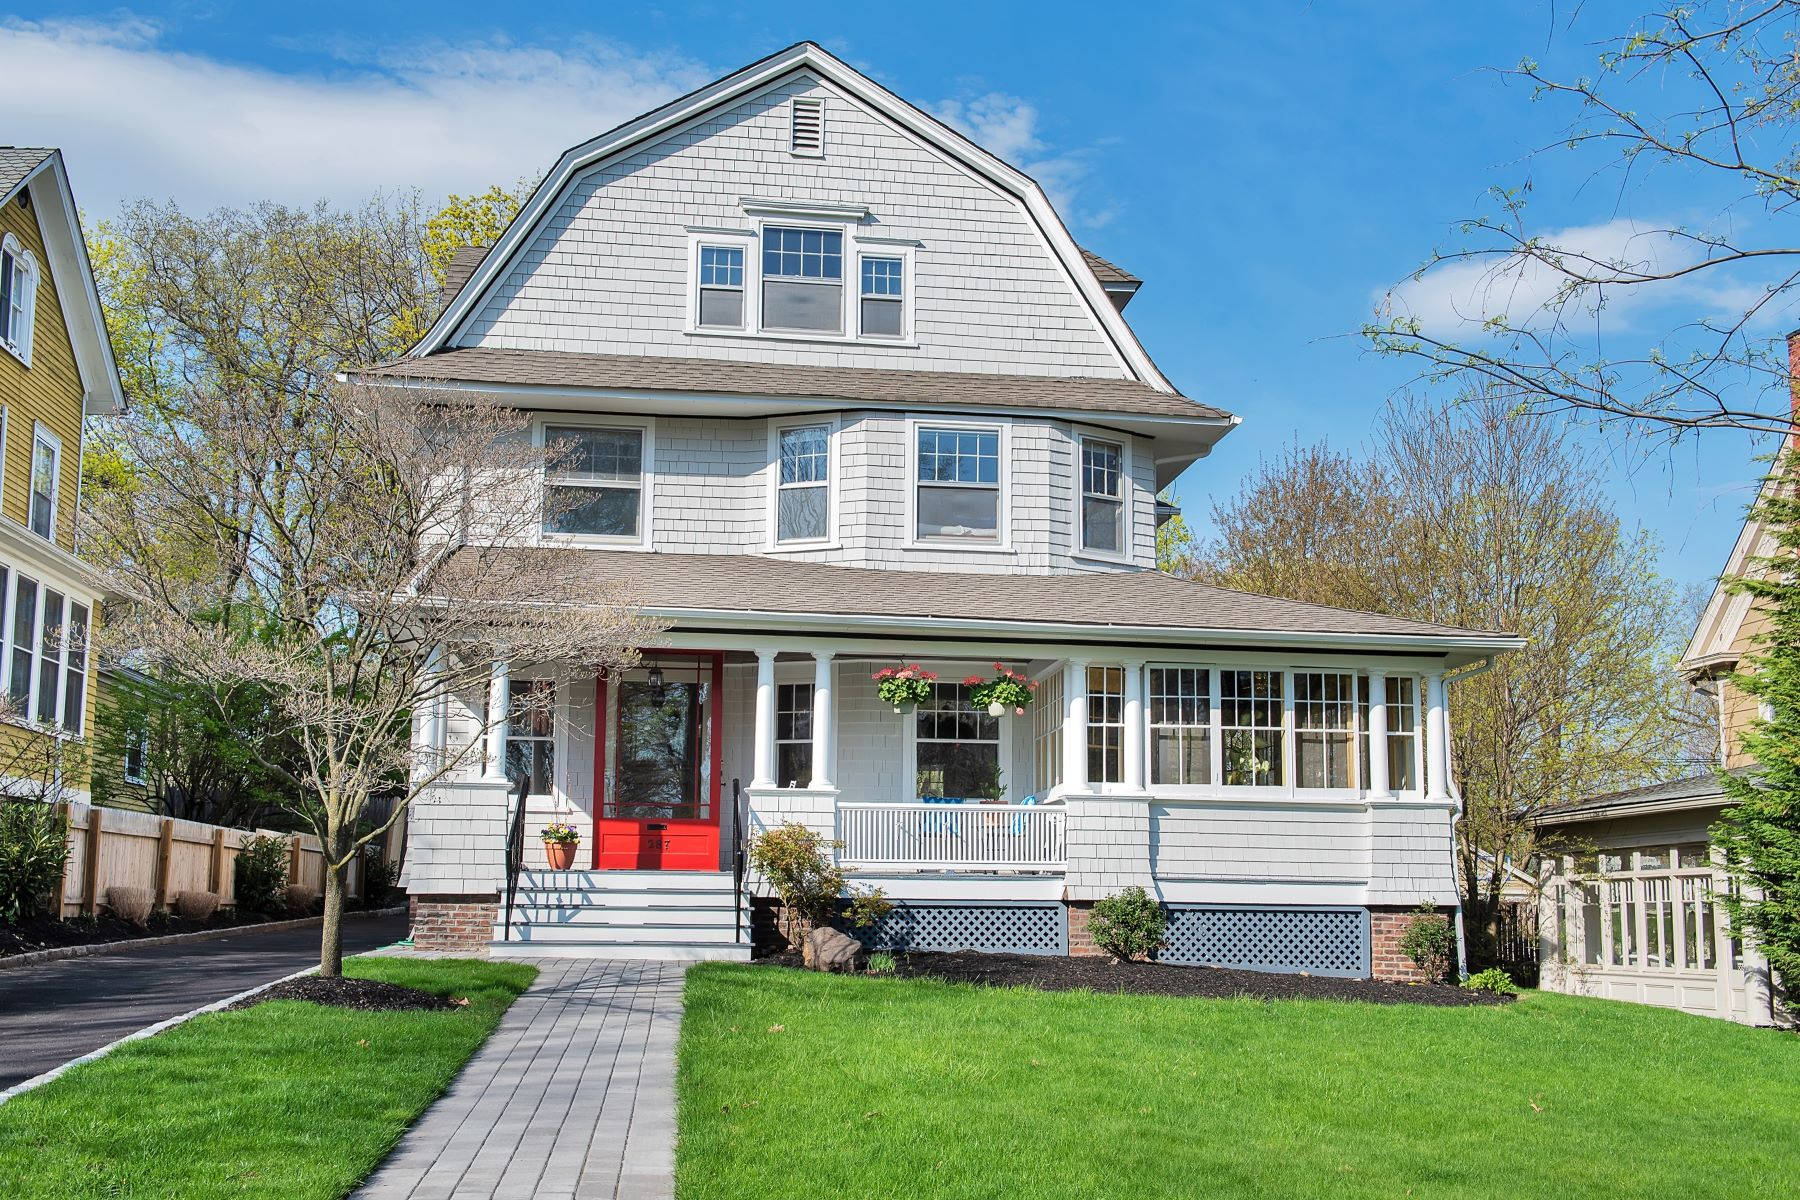 Single Family Home for Sale at Victorian in heart of Glen Ridge 287 Washington Street, Glen Ridge, New Jersey 07028 United States